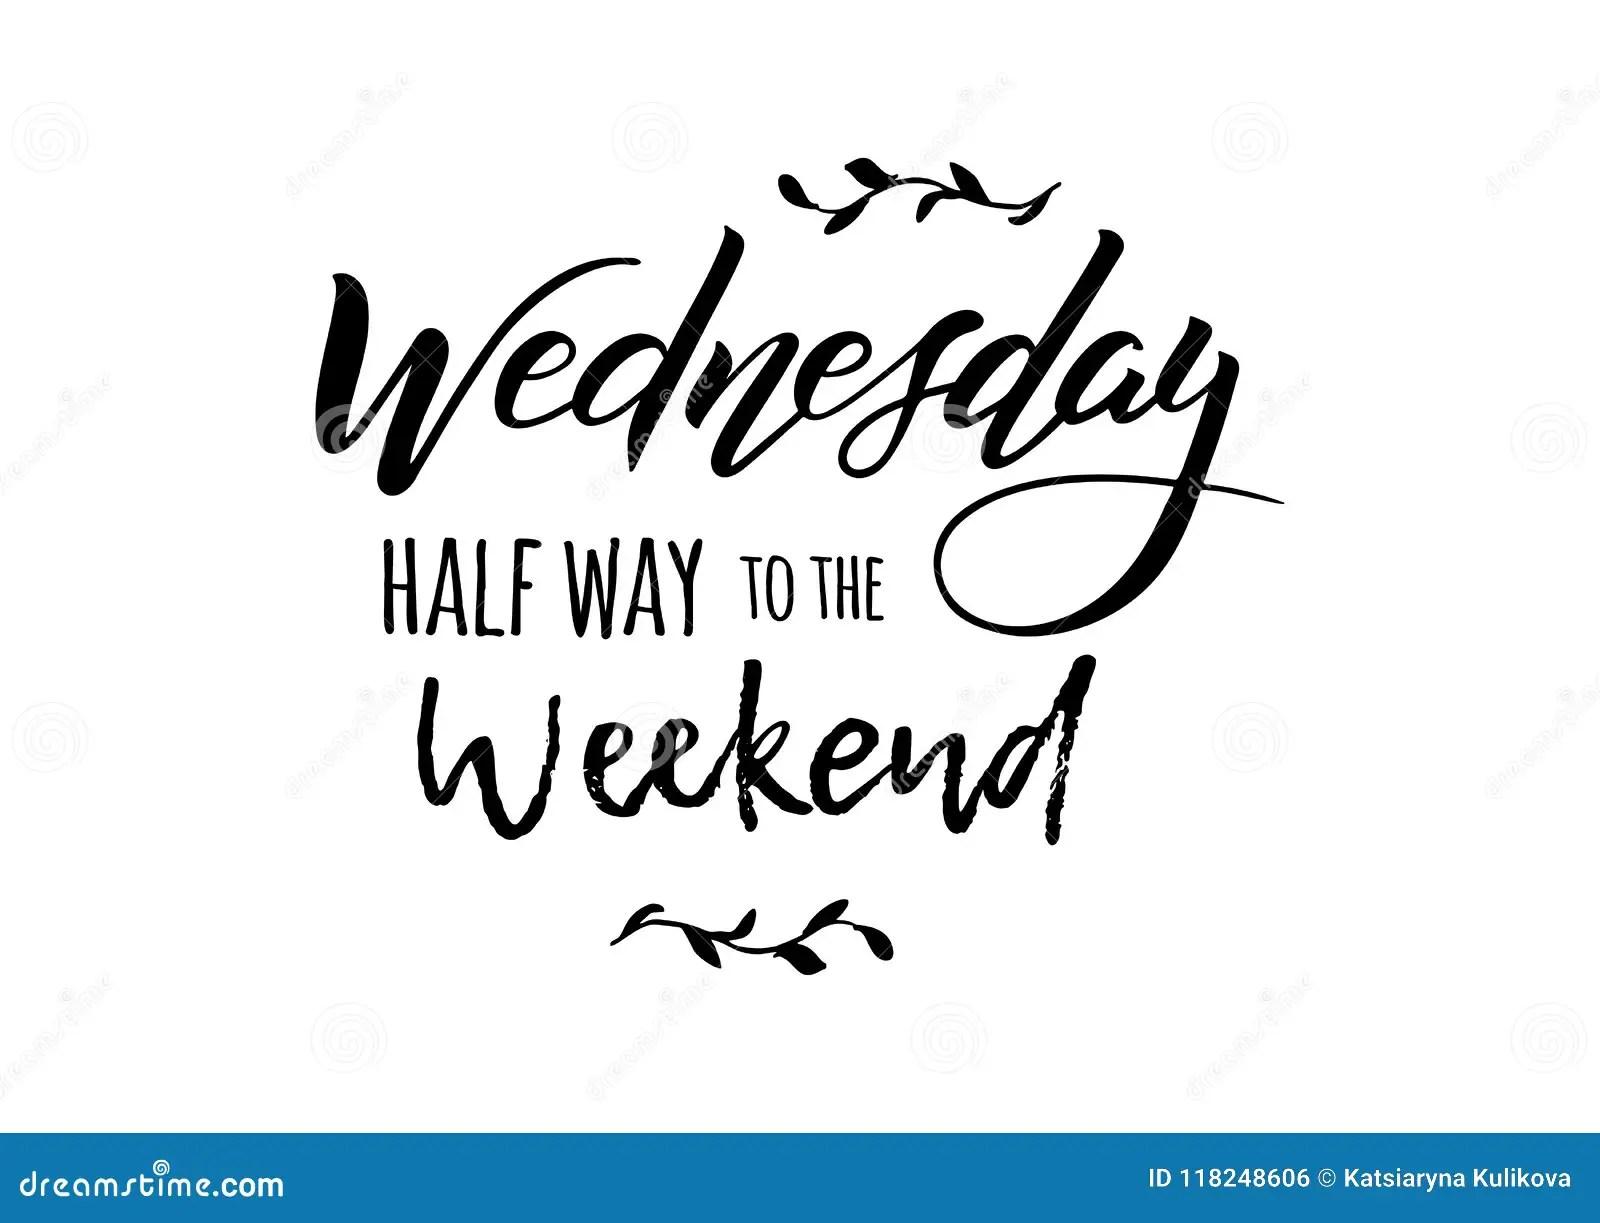 Wednesday Weekend Lettering Stock Vector